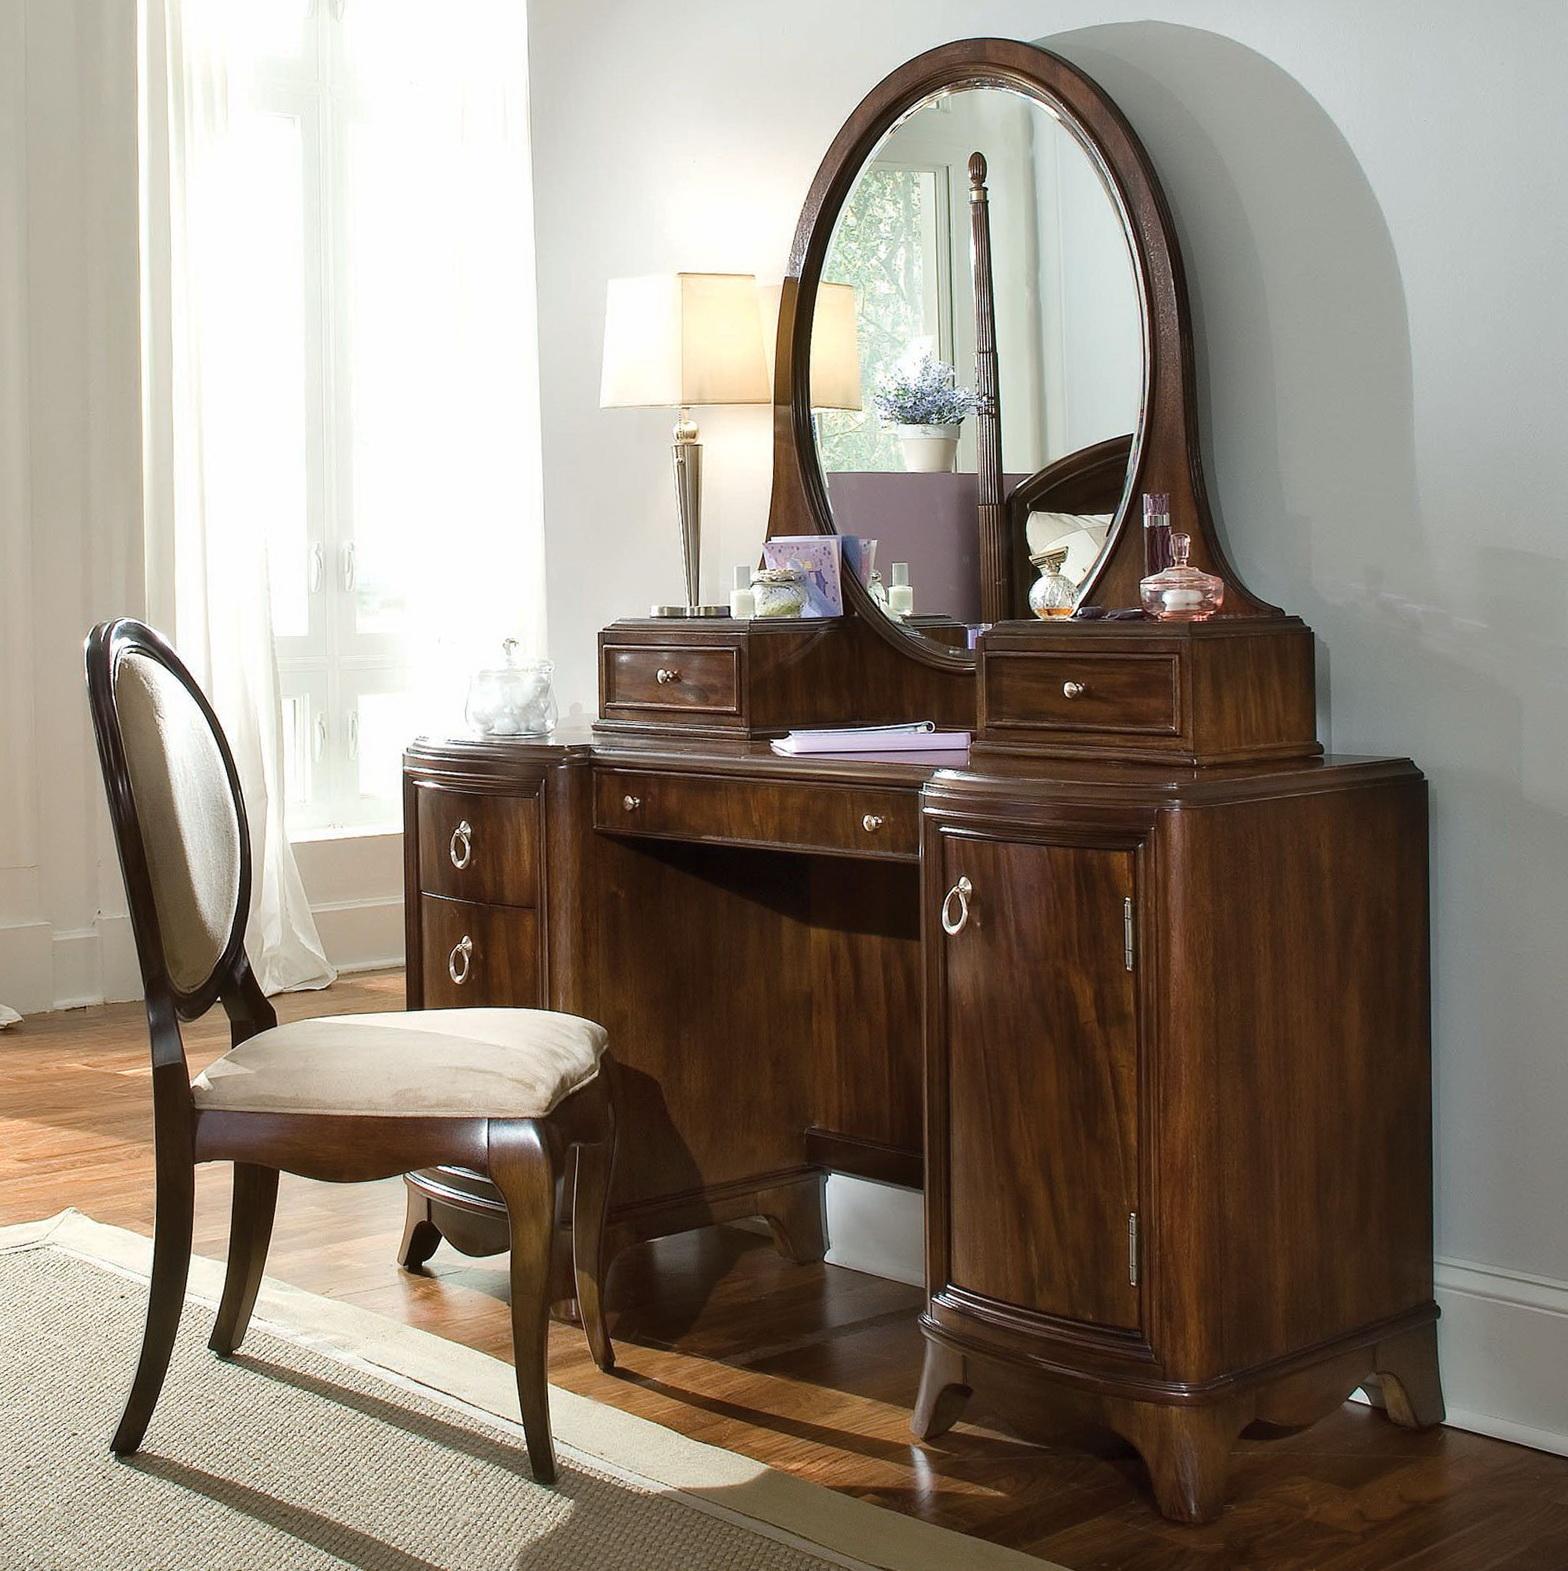 Vintage Vanity Dresser With Mirror. Vintage Vanity Dresser With Mirror Home  Design Ideas - Vintage Vanity Dresser With Mirror Pilotschoolbanyuwangi.com